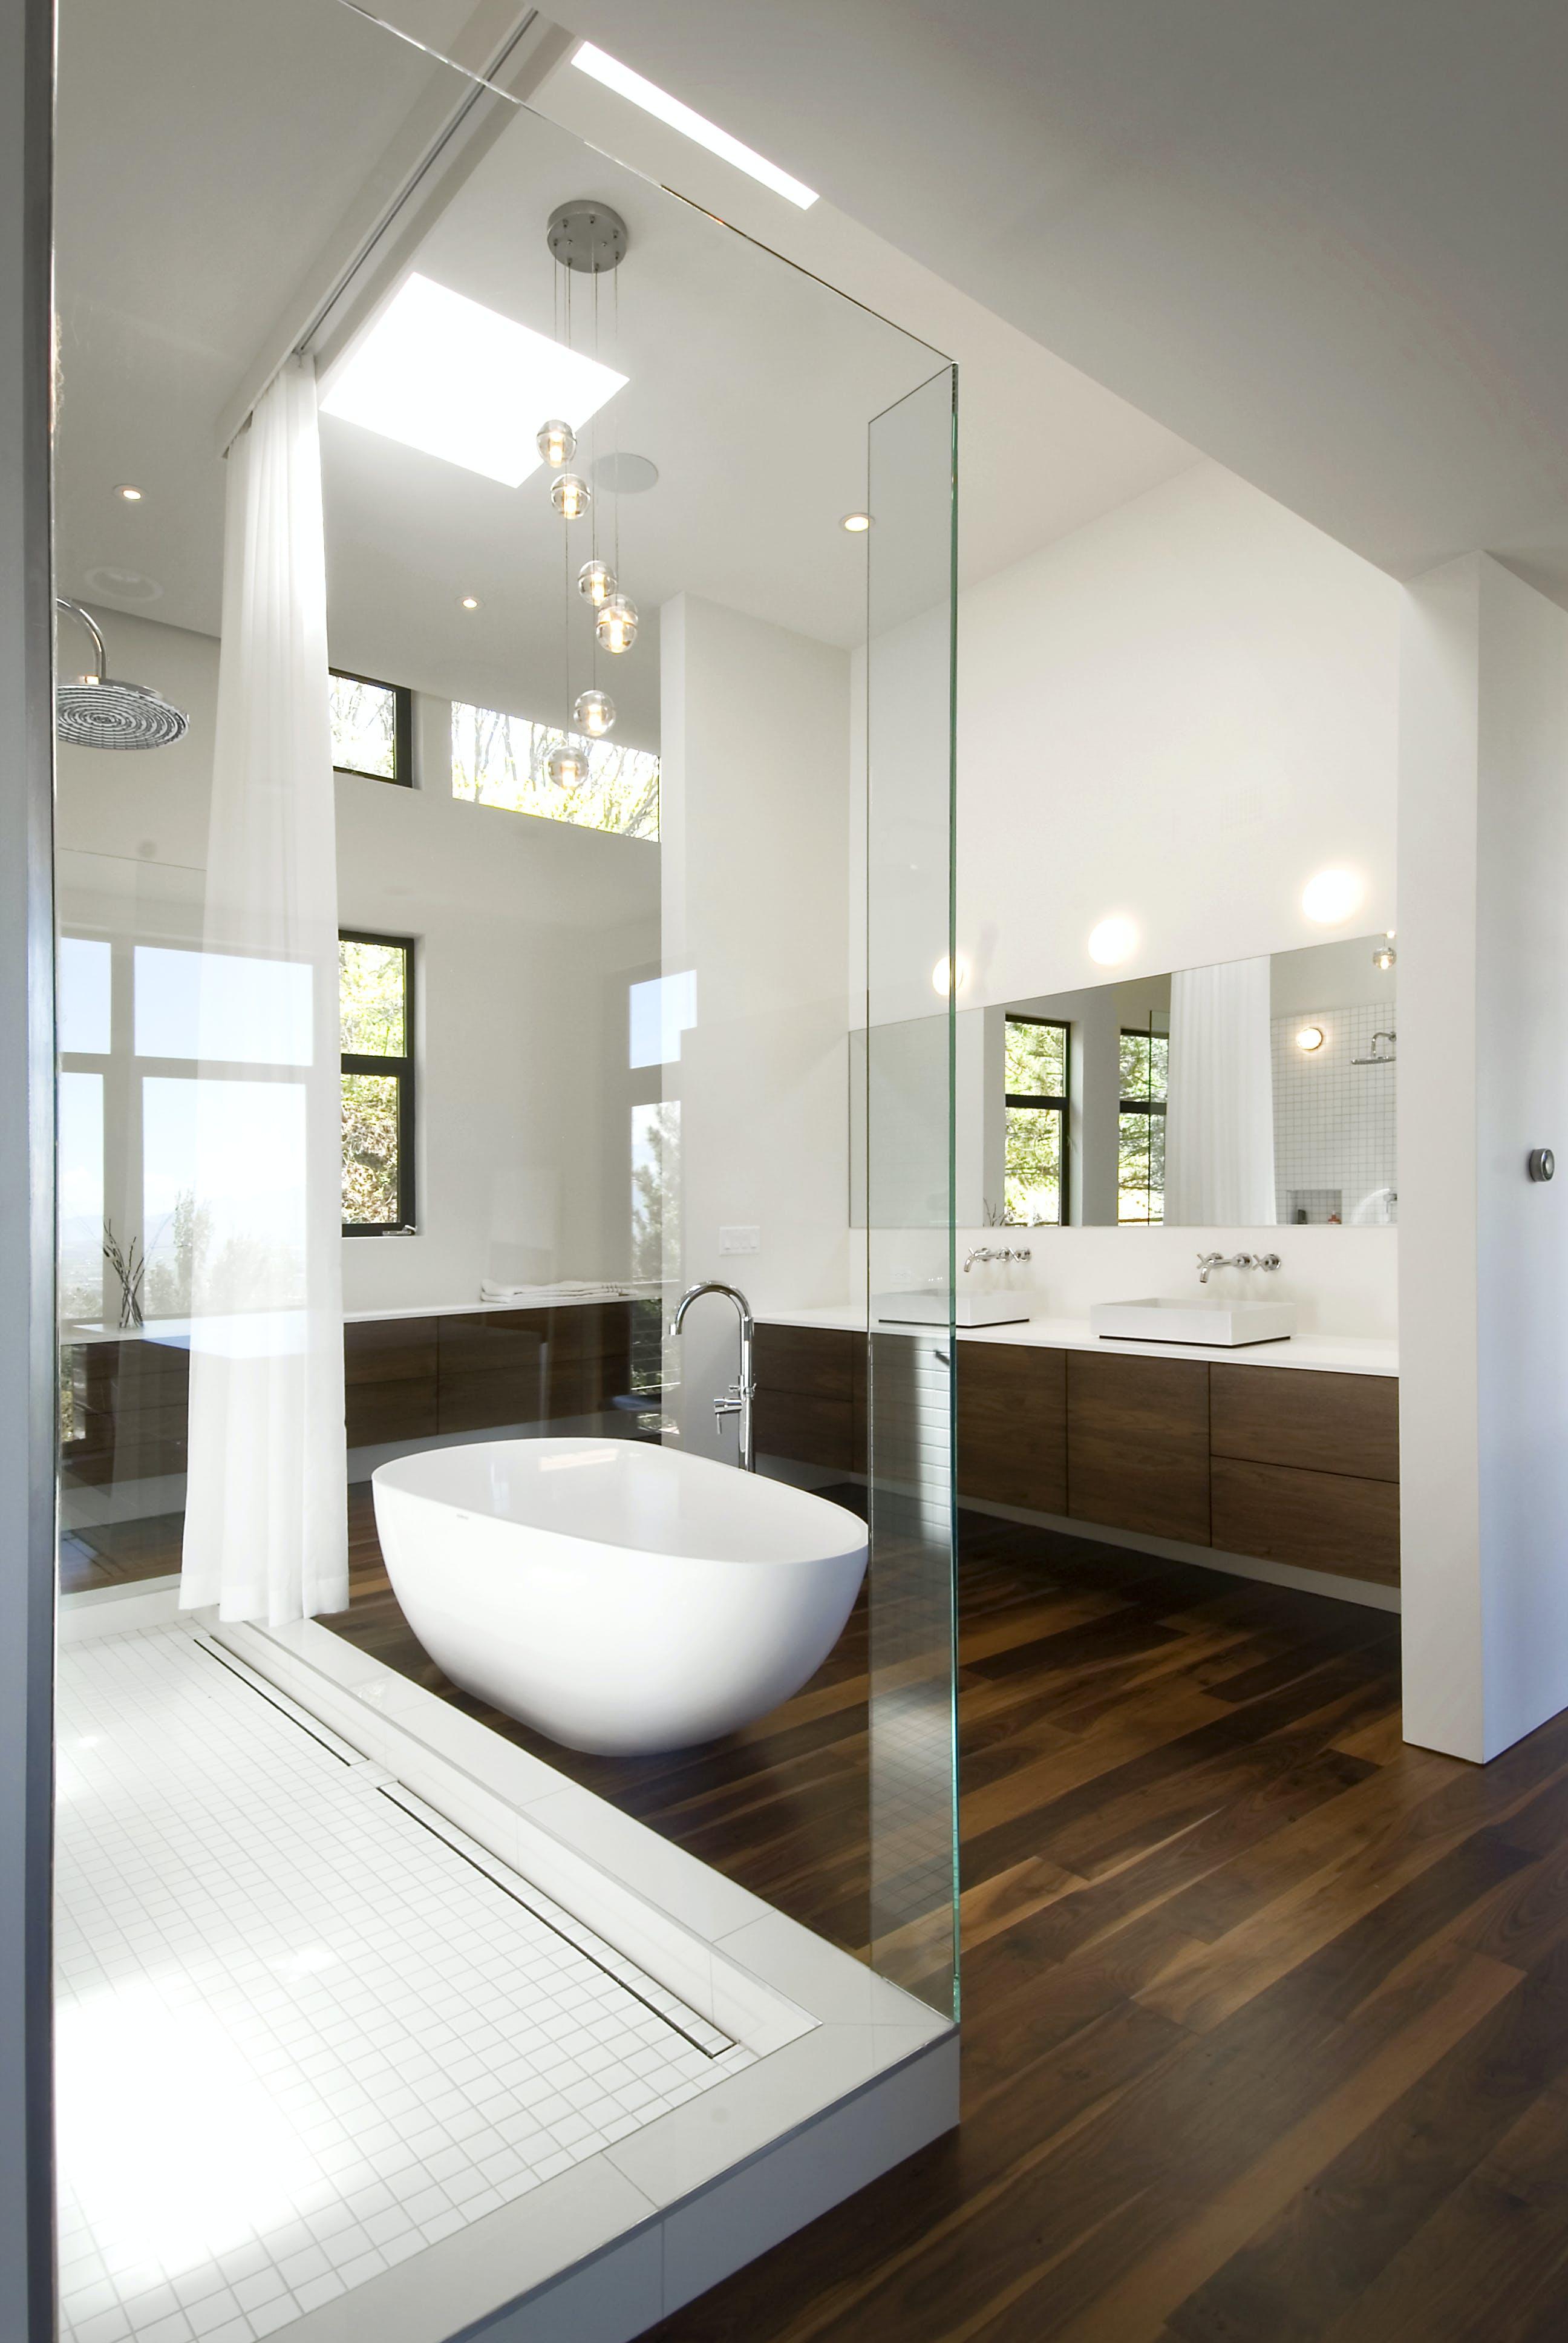 kristianna imbue design archinect. Black Bedroom Furniture Sets. Home Design Ideas